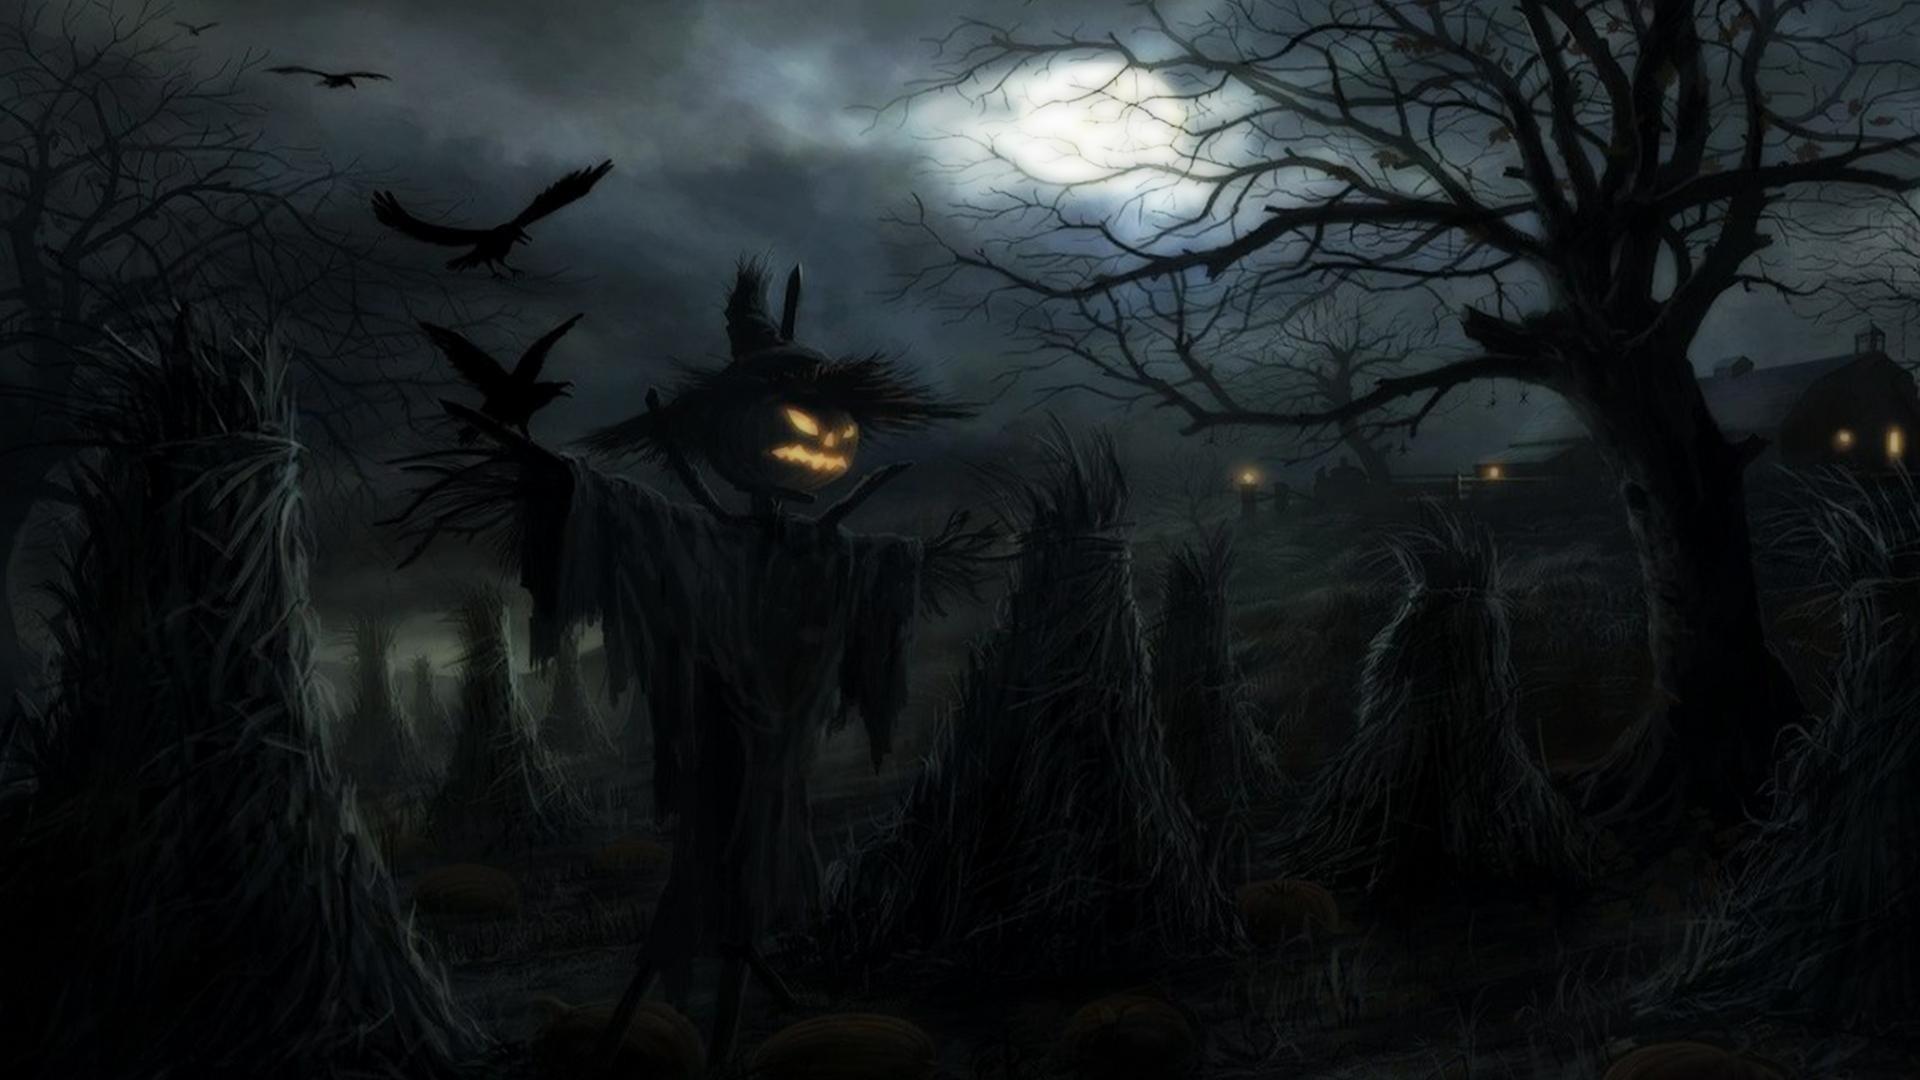 Scary-Halloween-Wallpaper-HD